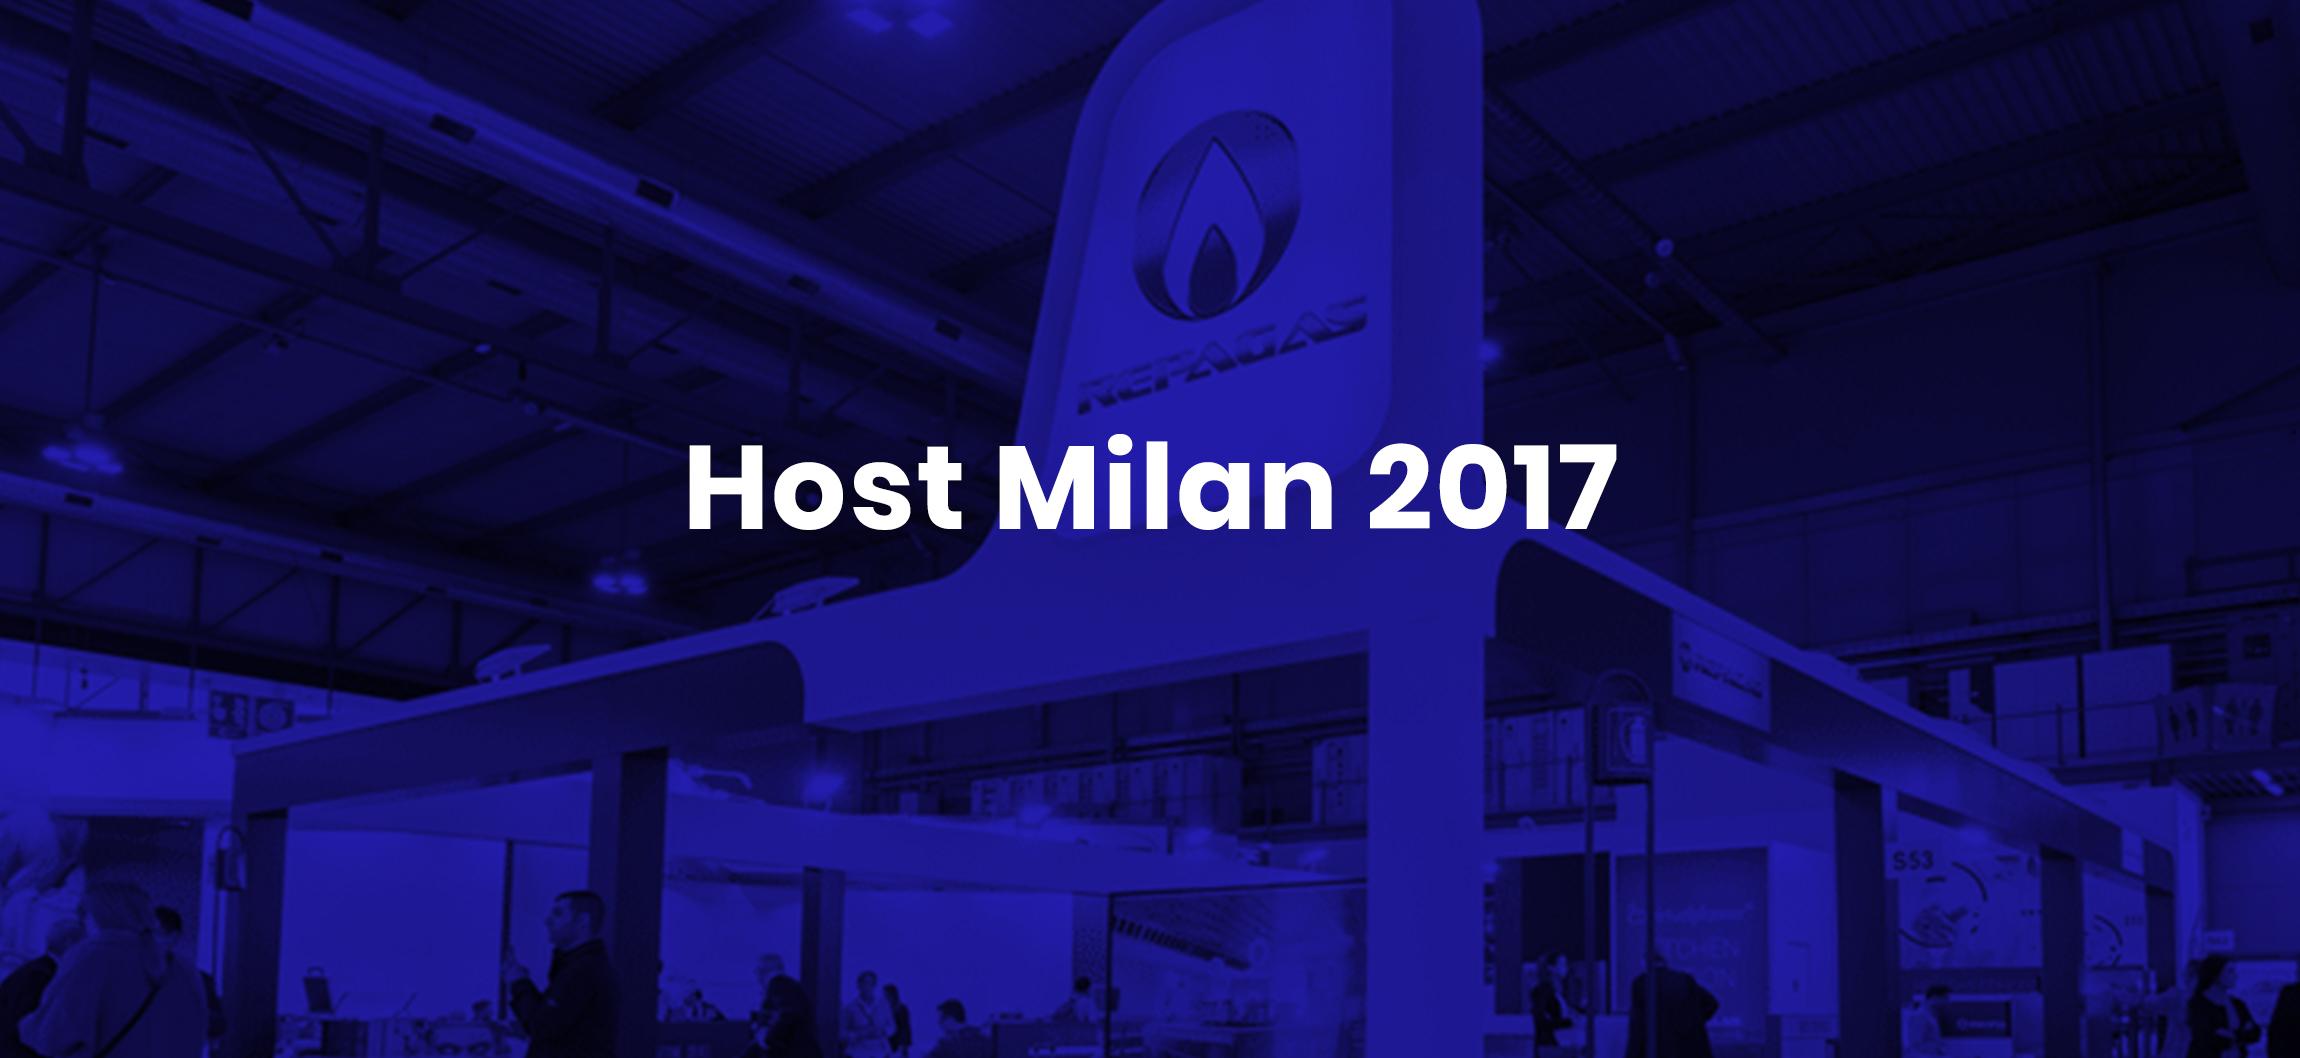 Host Milan 2017 Repagas